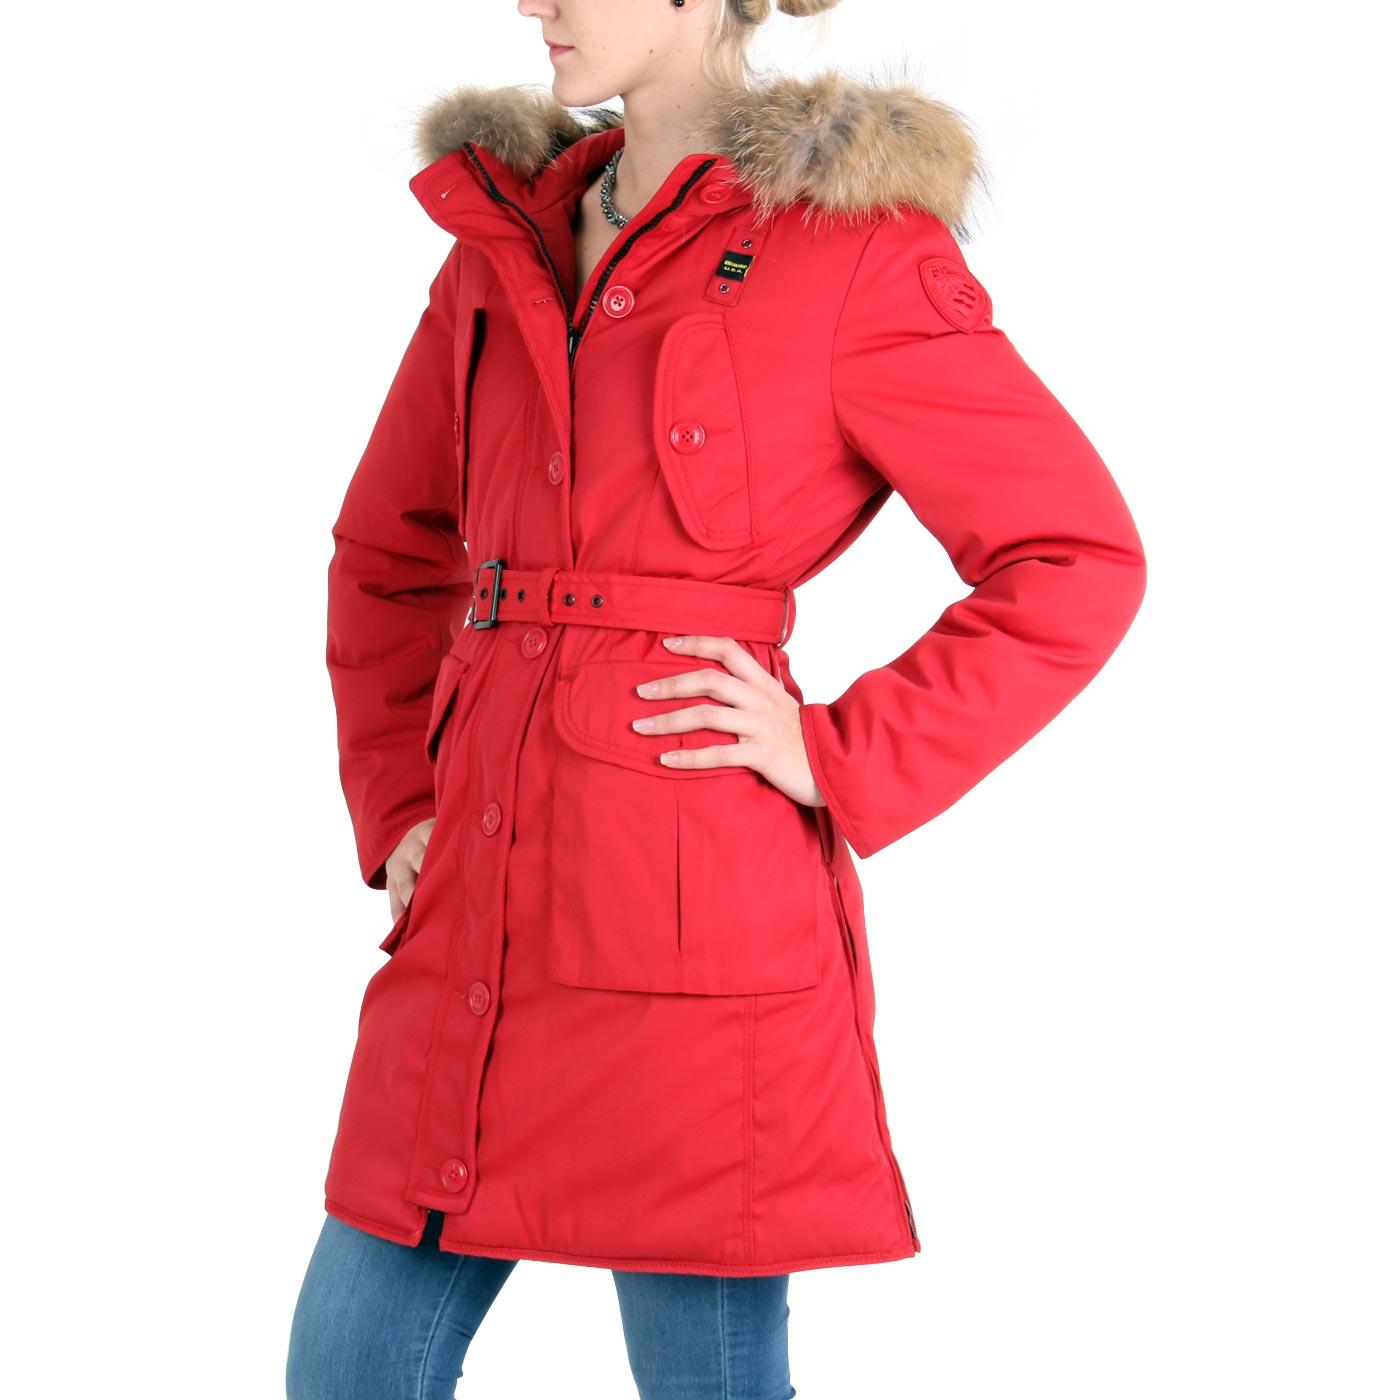 blauer usa damen winter daunen parka mantel jacke red. Black Bedroom Furniture Sets. Home Design Ideas